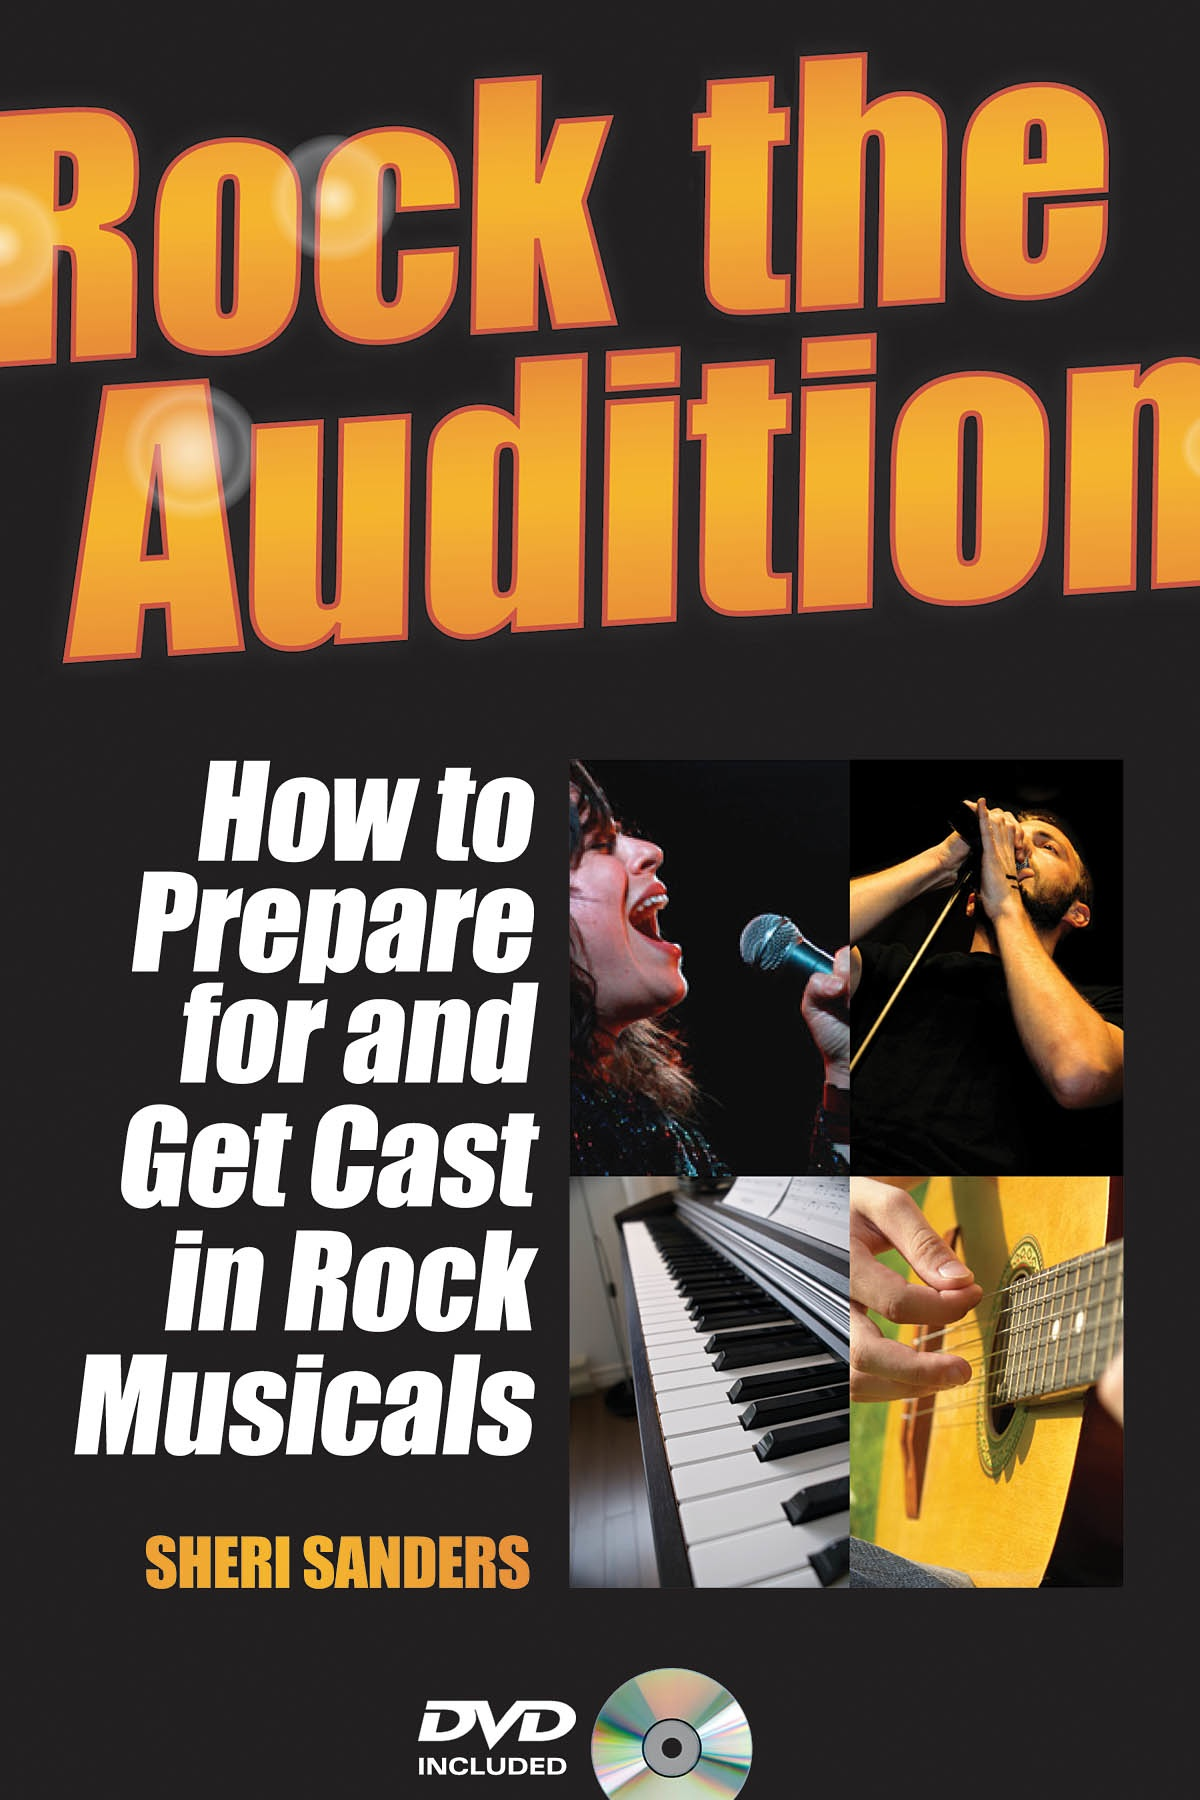 2011-05-13-RocktheAudition.jpg